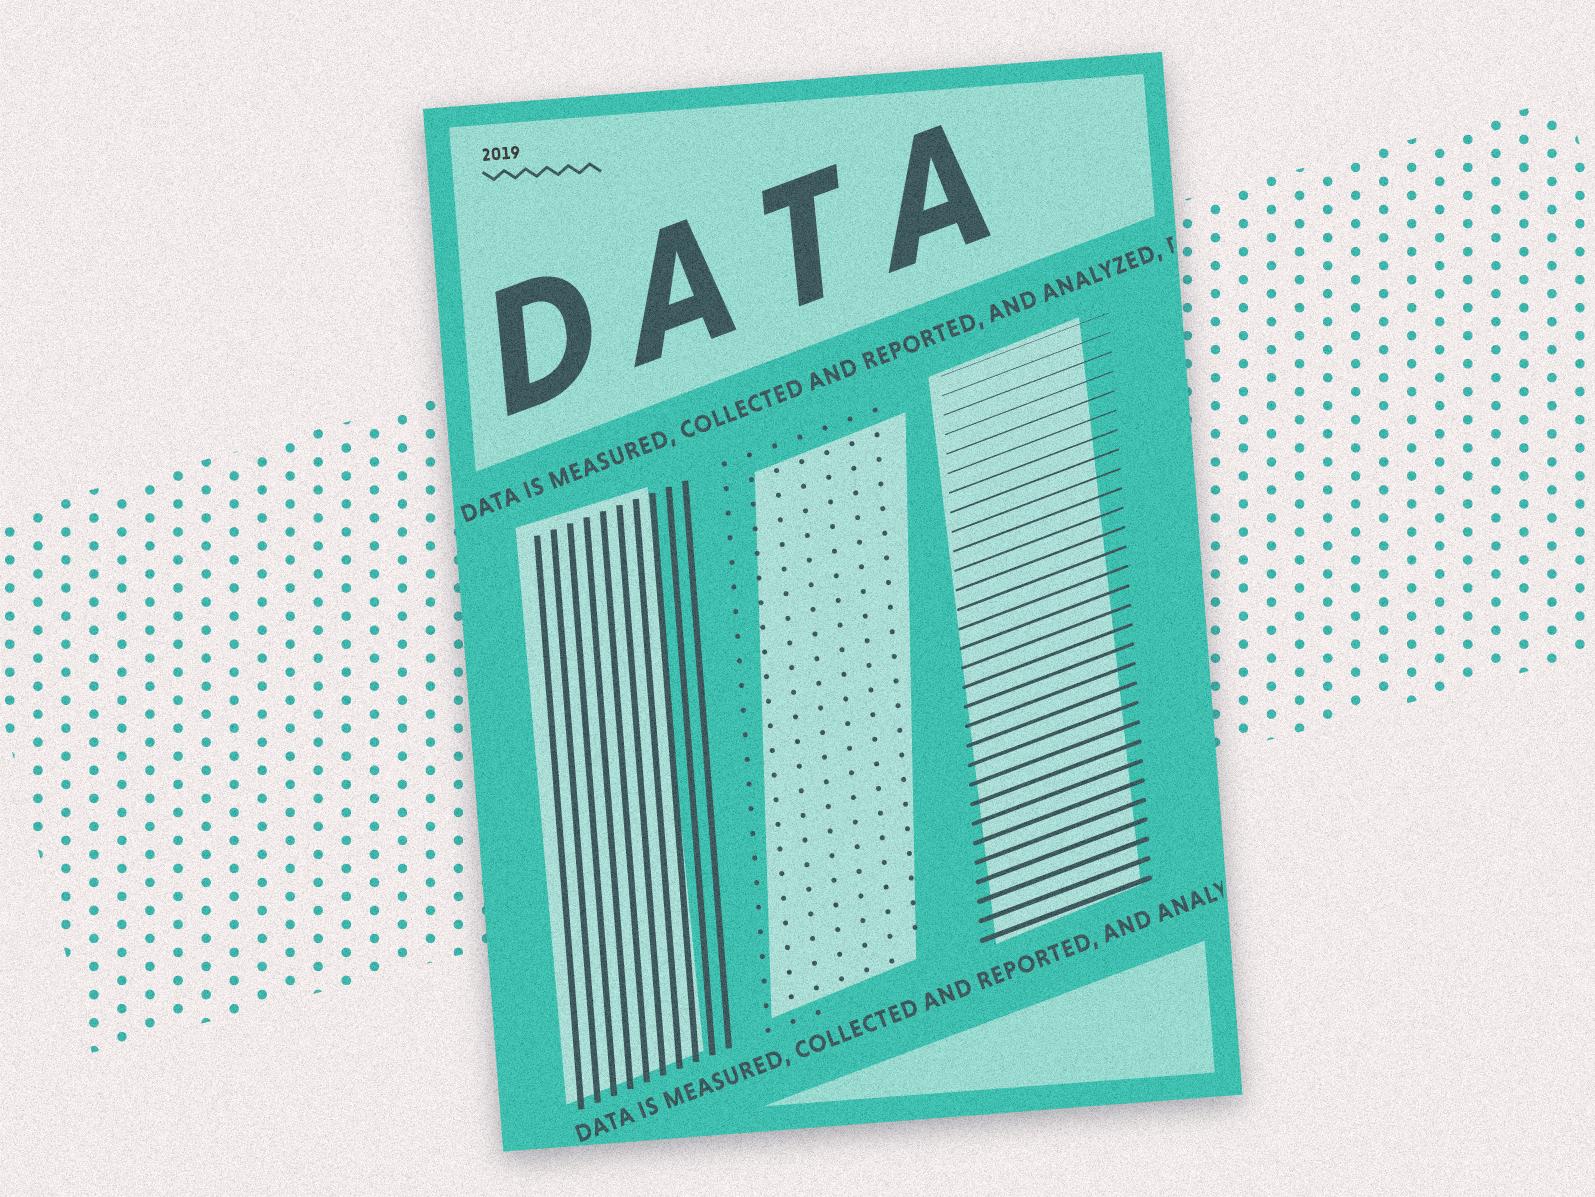 Data! geometric data green gradient texture patterns computer abstract poster magazine ui illustration